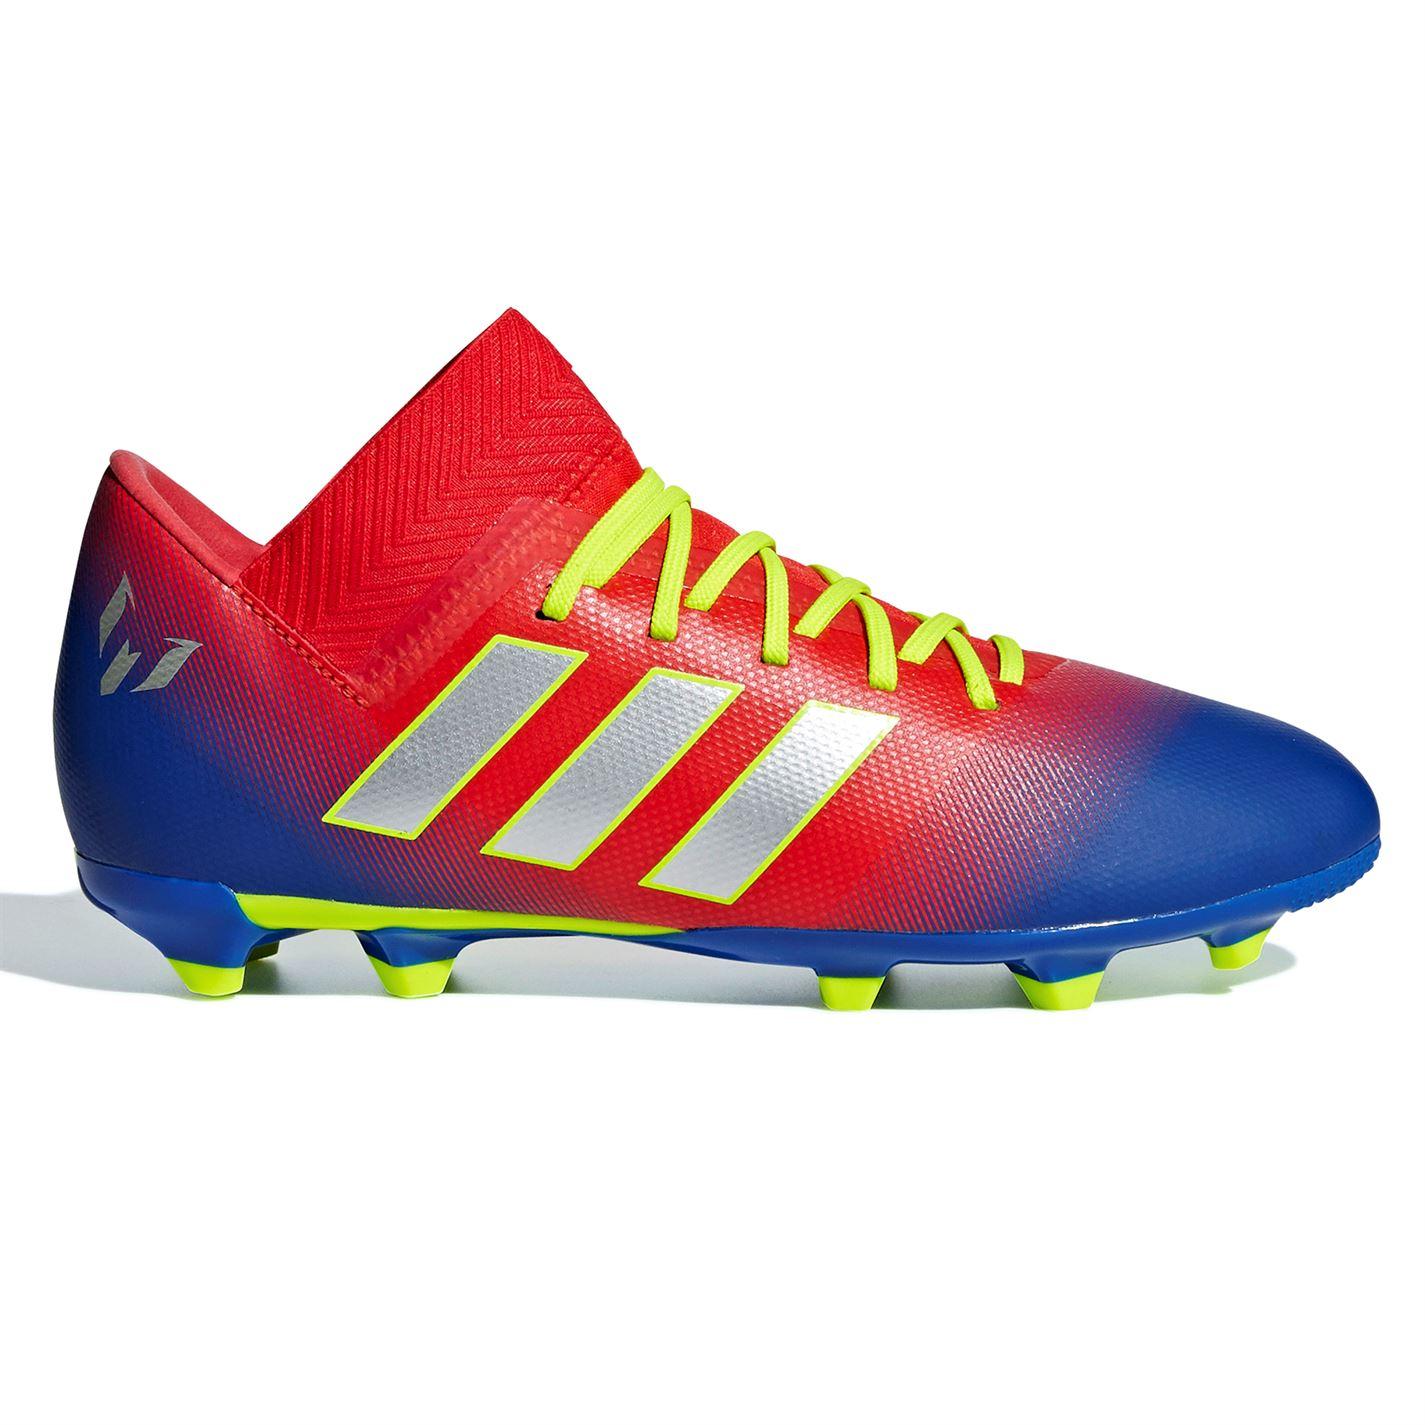 kopačky adidas Nemeziz Messi 18.3 dětské FG